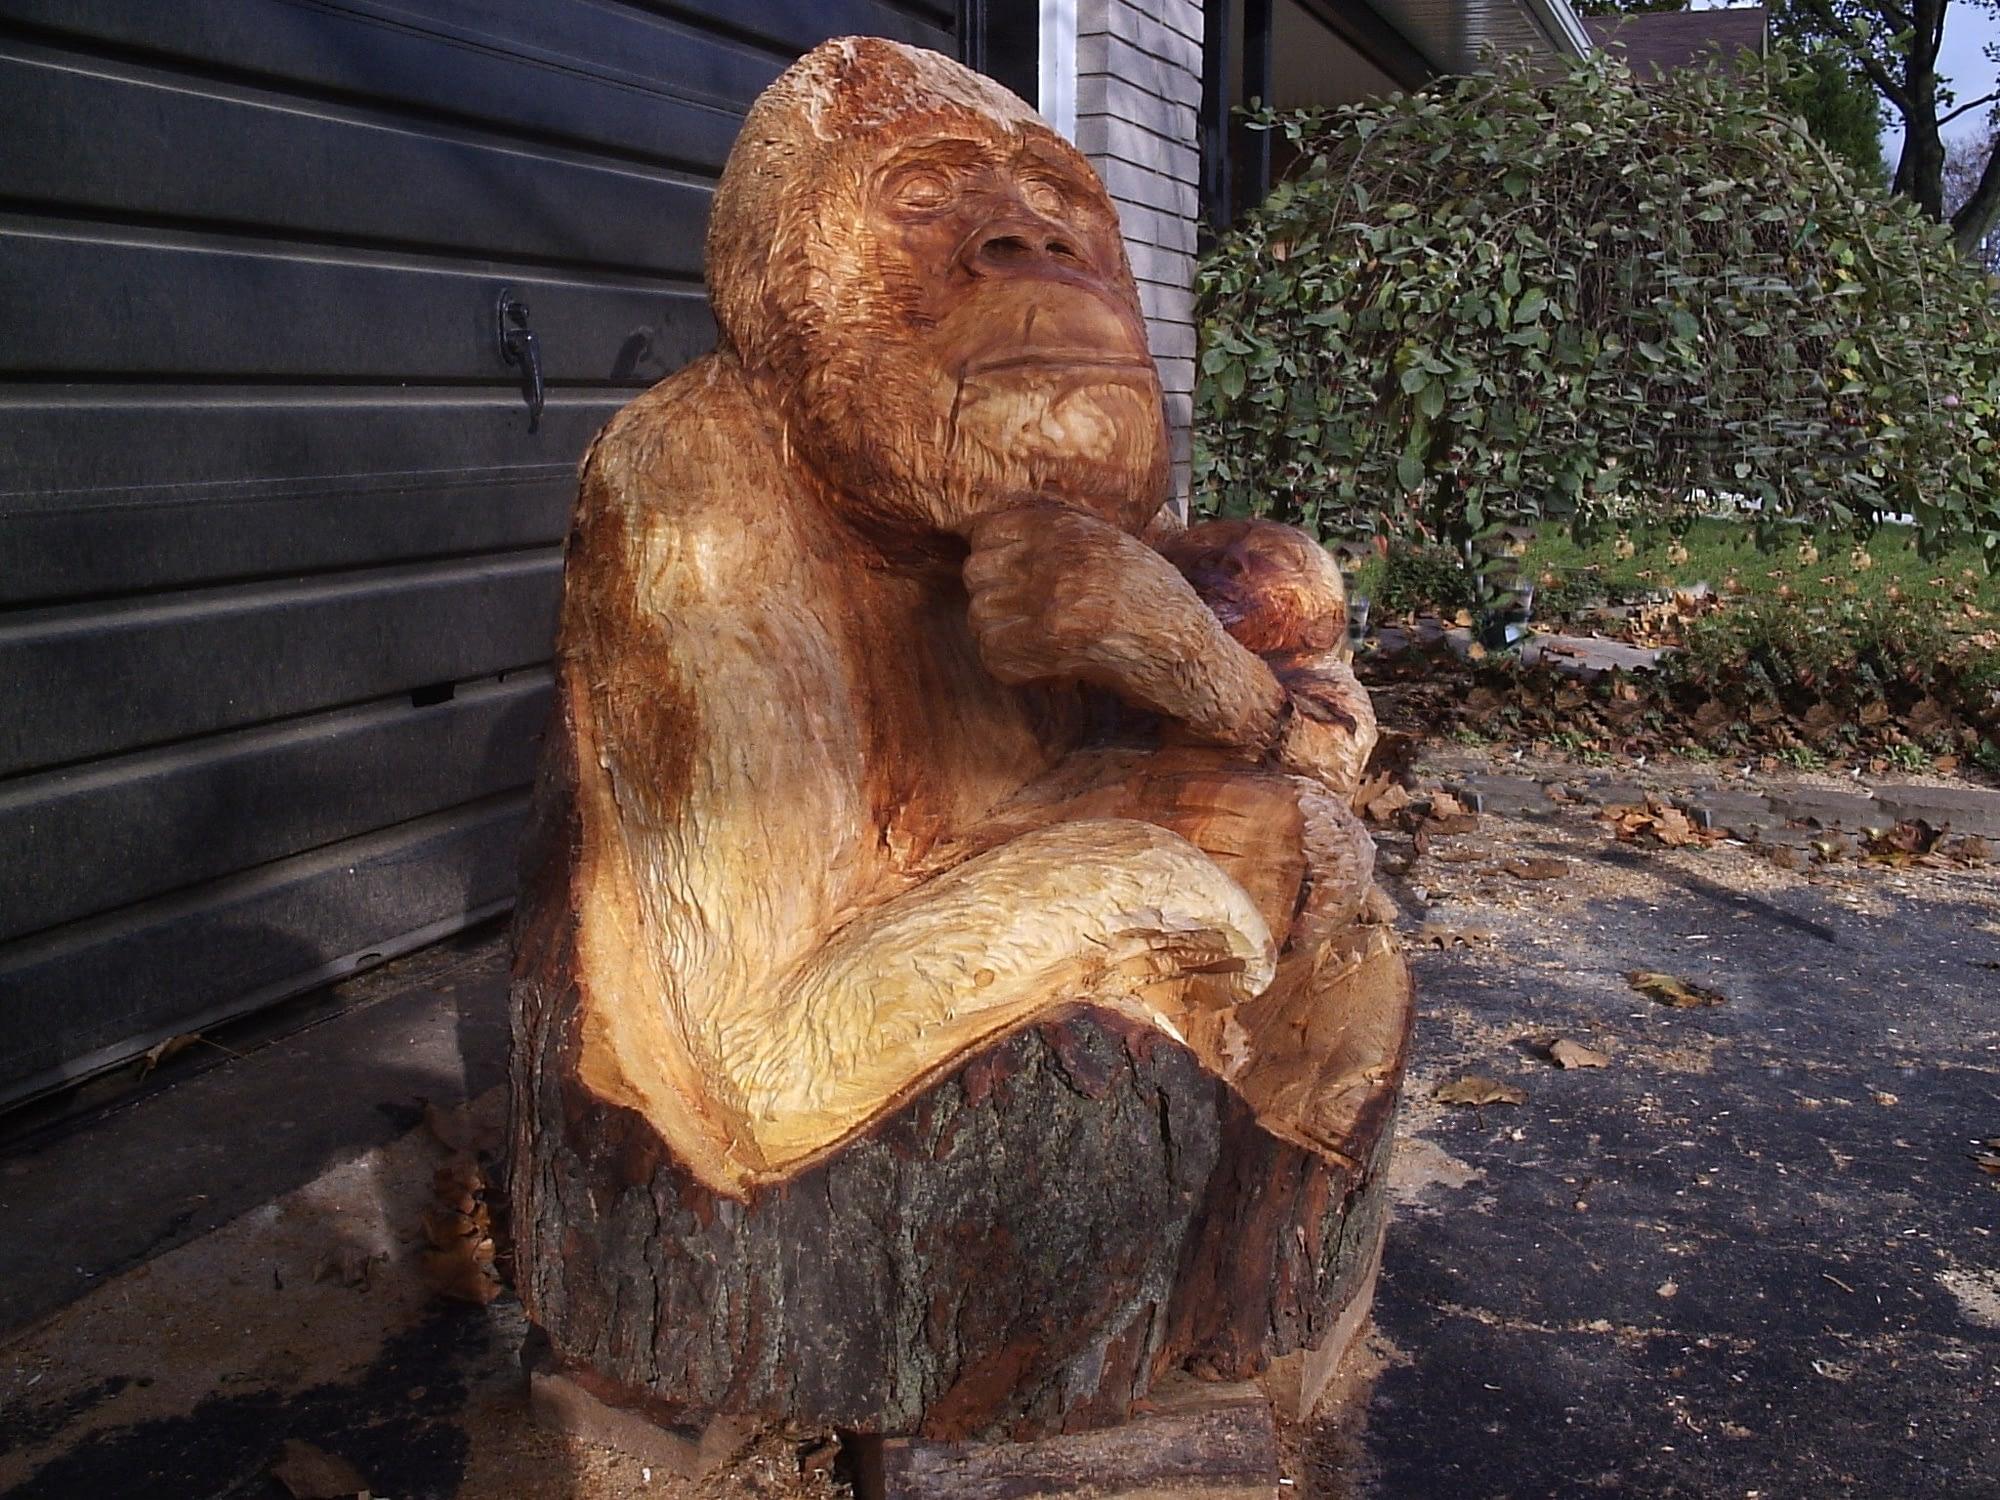 Carving, Monkey, Gorilla